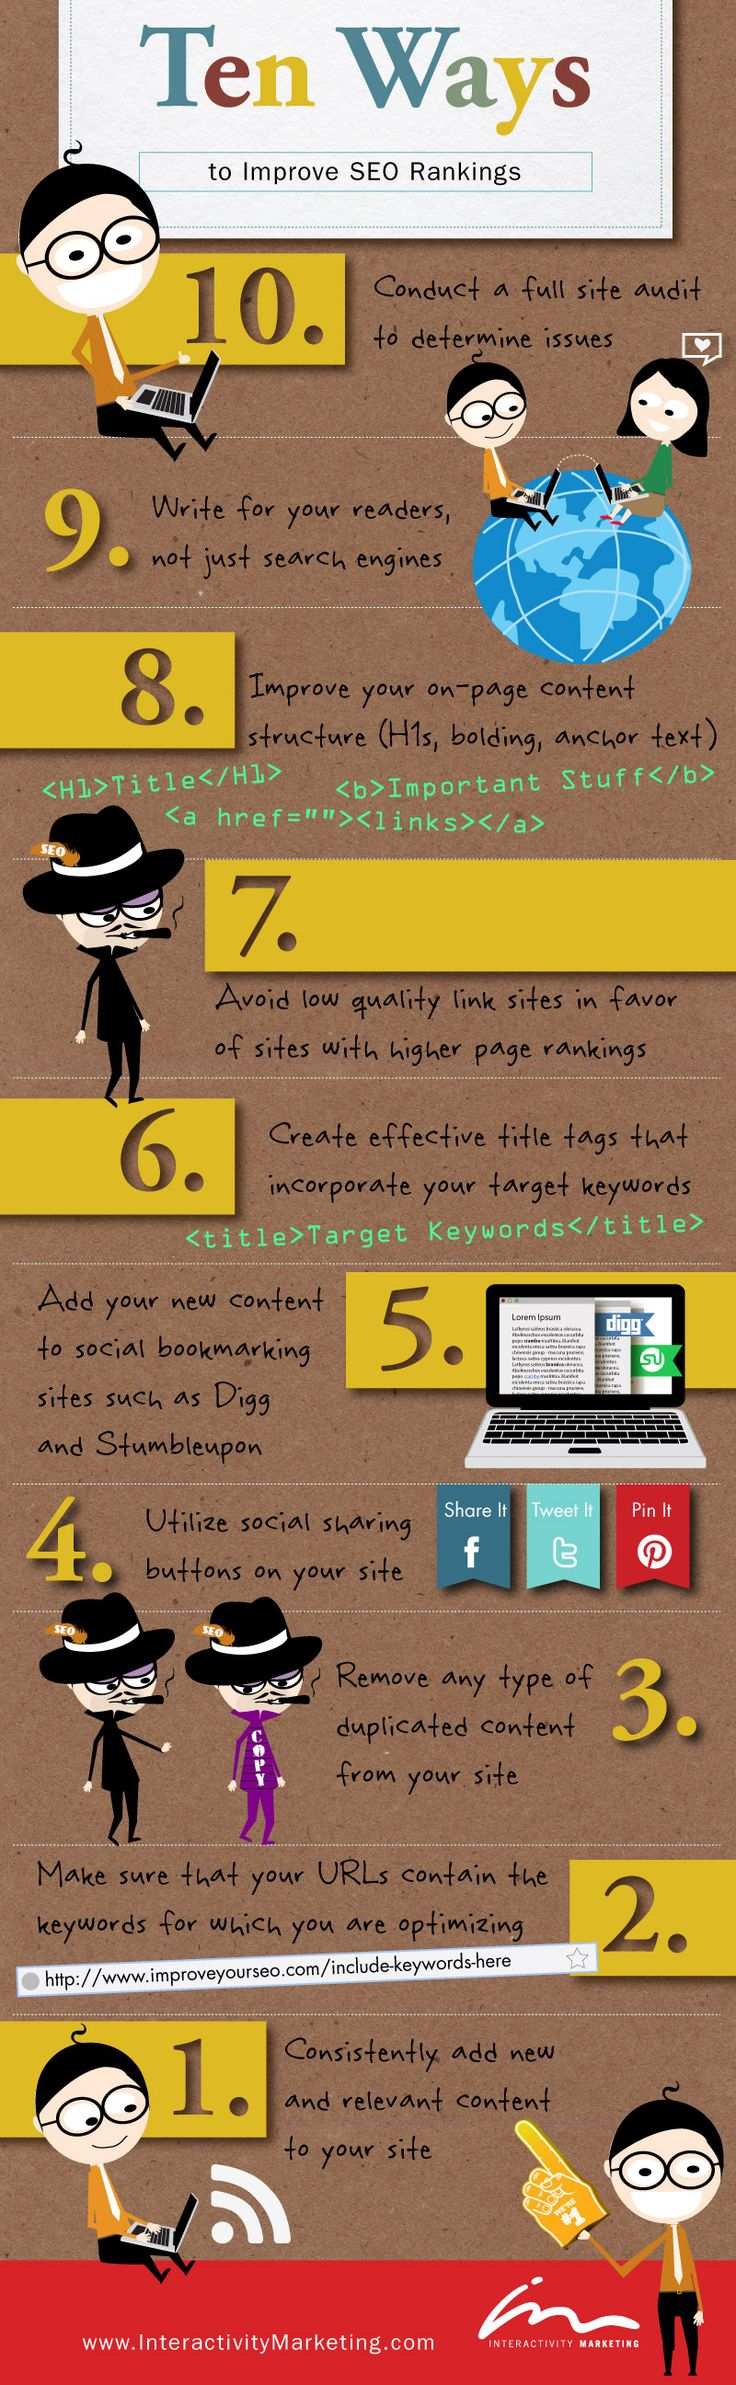 Ten Ways To Improve SEO Rankin